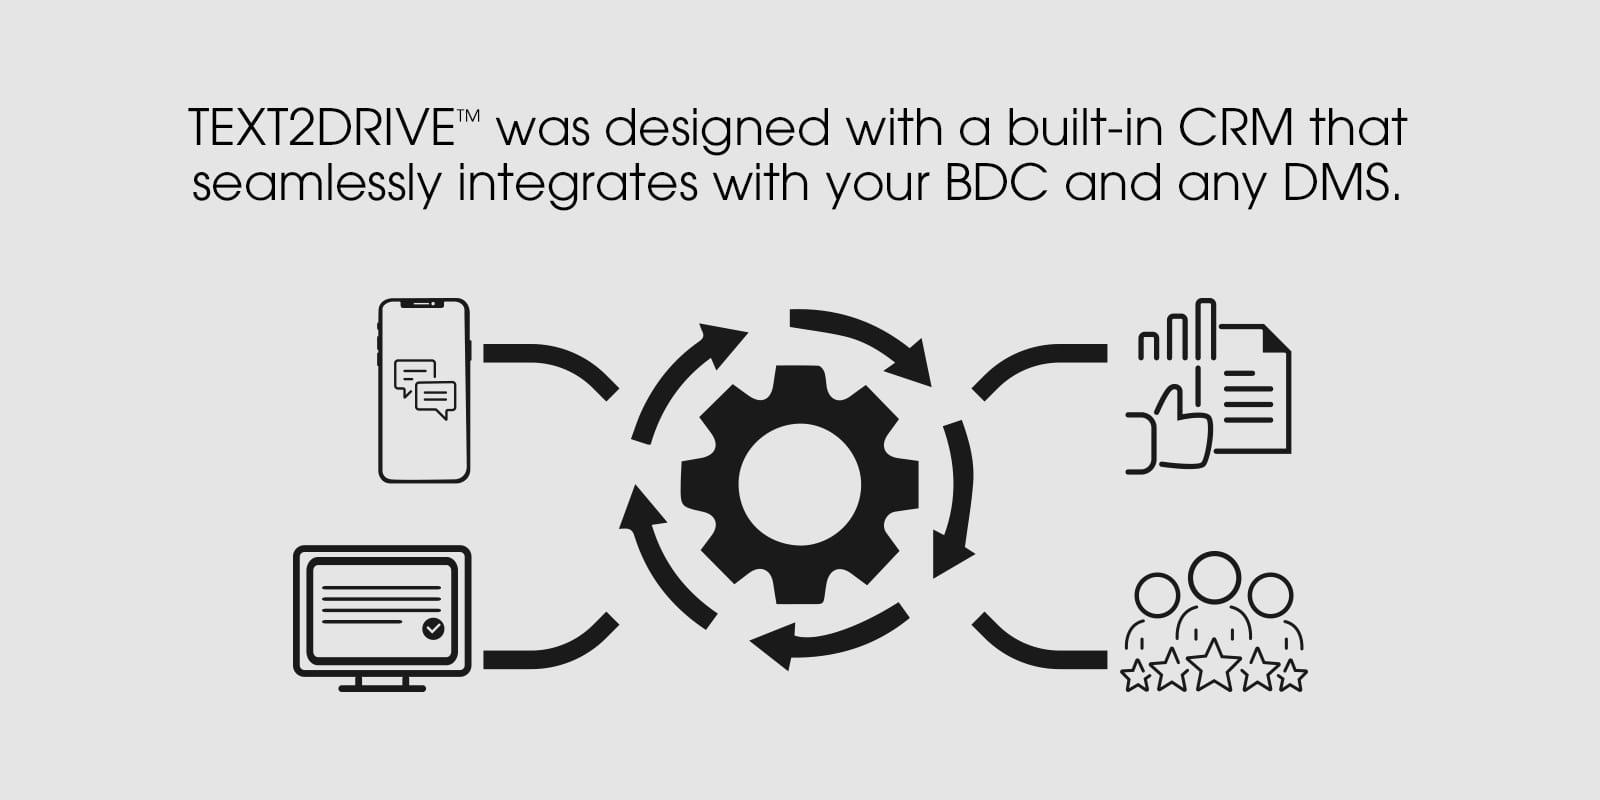 TEXT2DRIVE communication platform integration - BDC and DMS